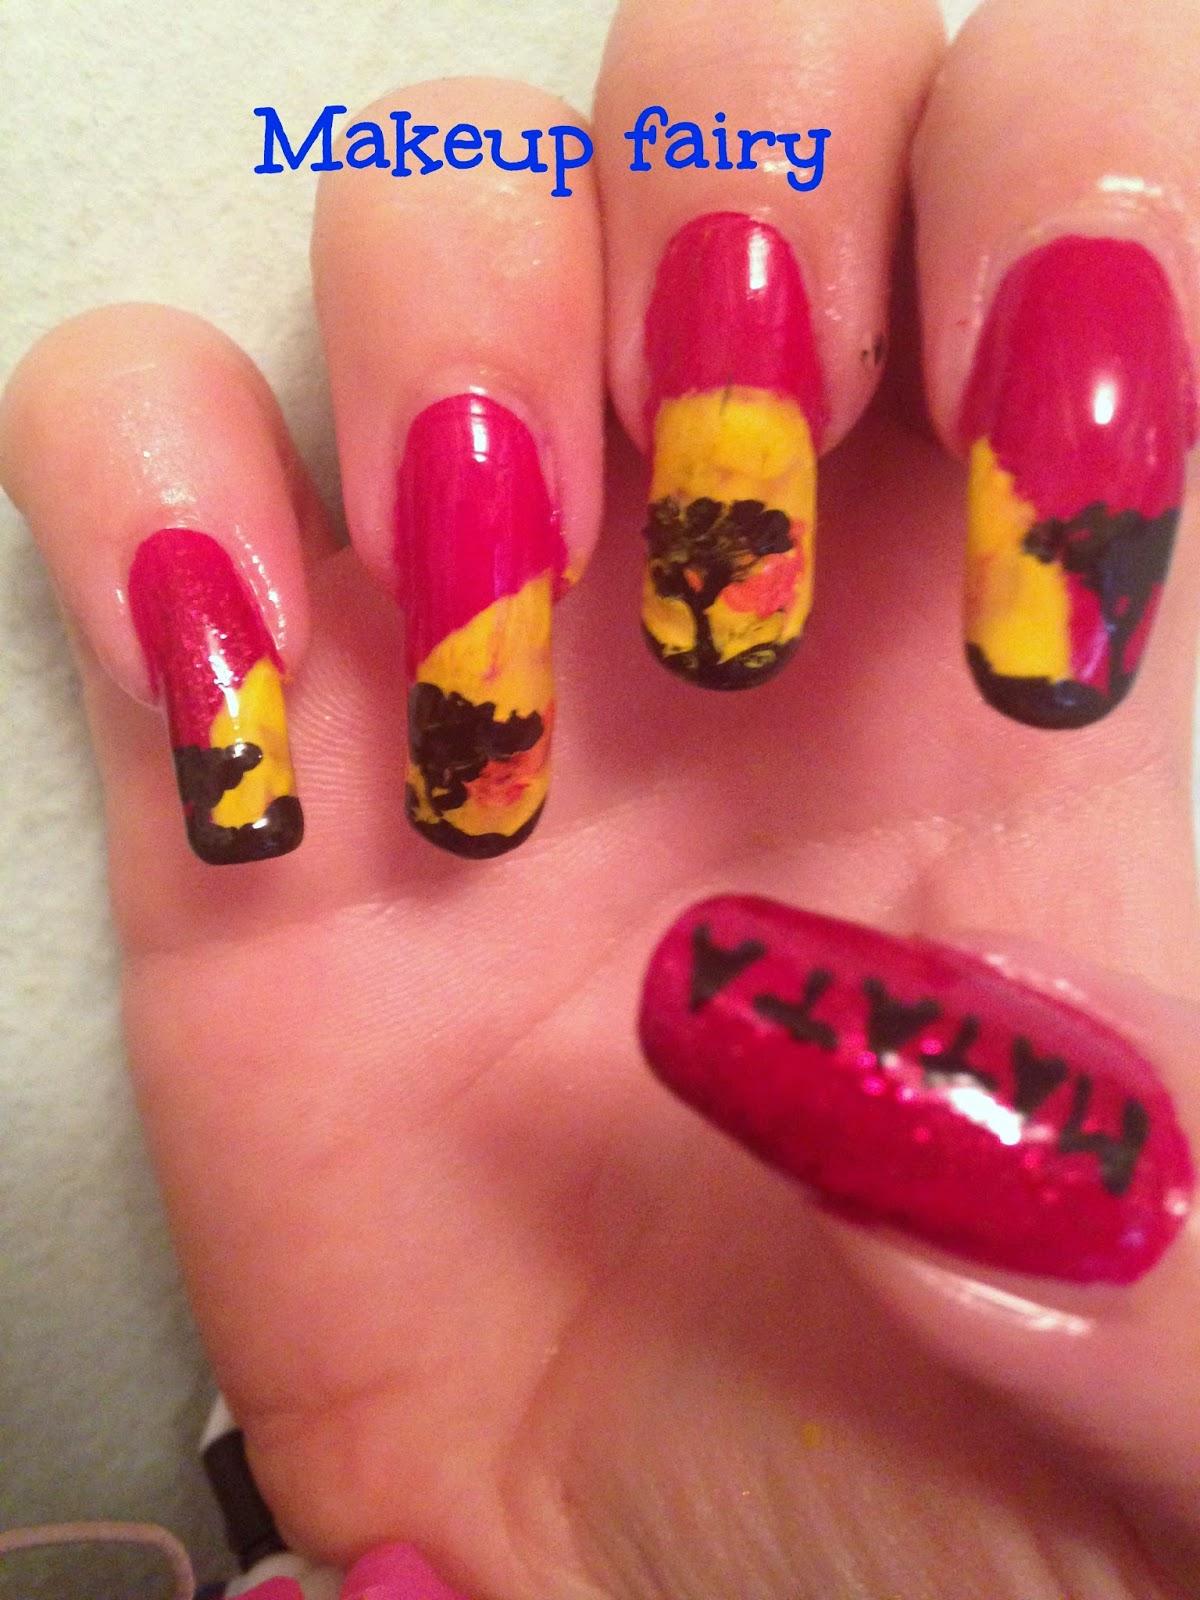 Tinklesmakeup: the lion king nail art -hakuna matata!